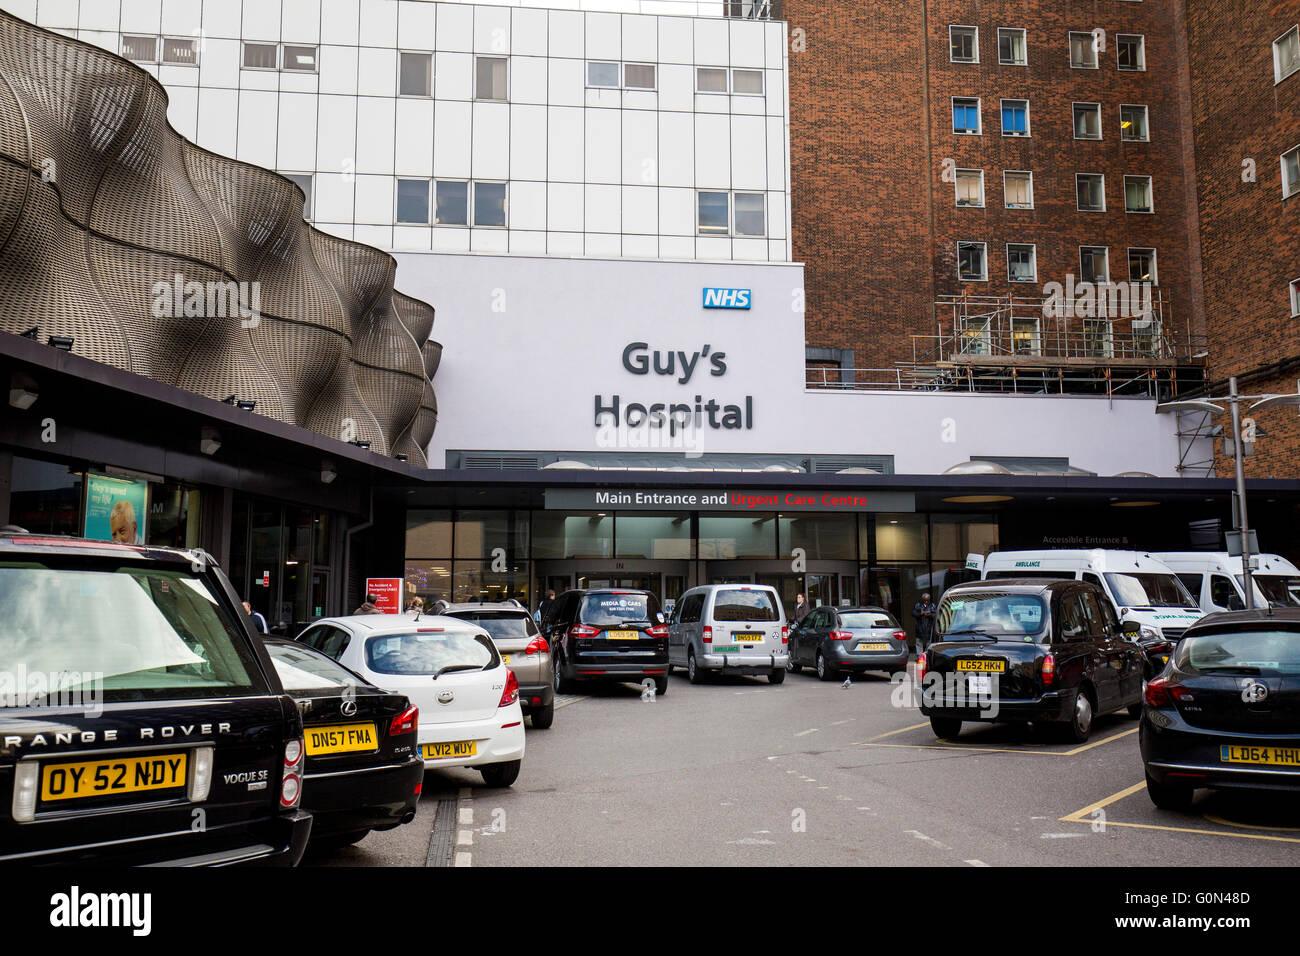 Guy's Hospital NHS GV Entrée principale Photo Stock